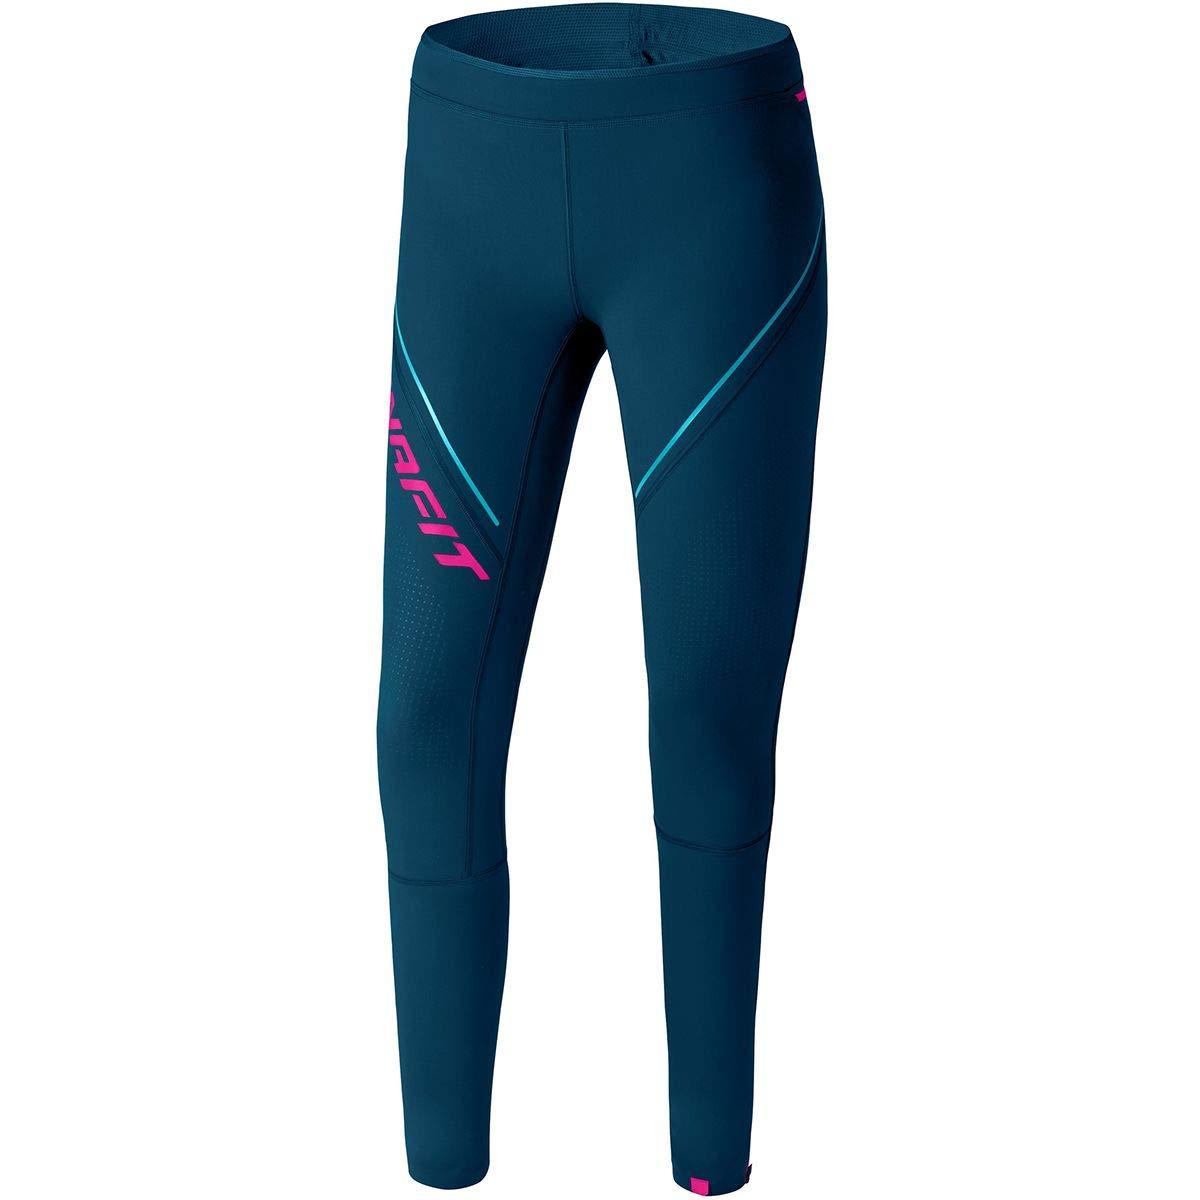 DYNAFIT Winter Running Tight Damen Poseidon 2019 Laufsport Hose